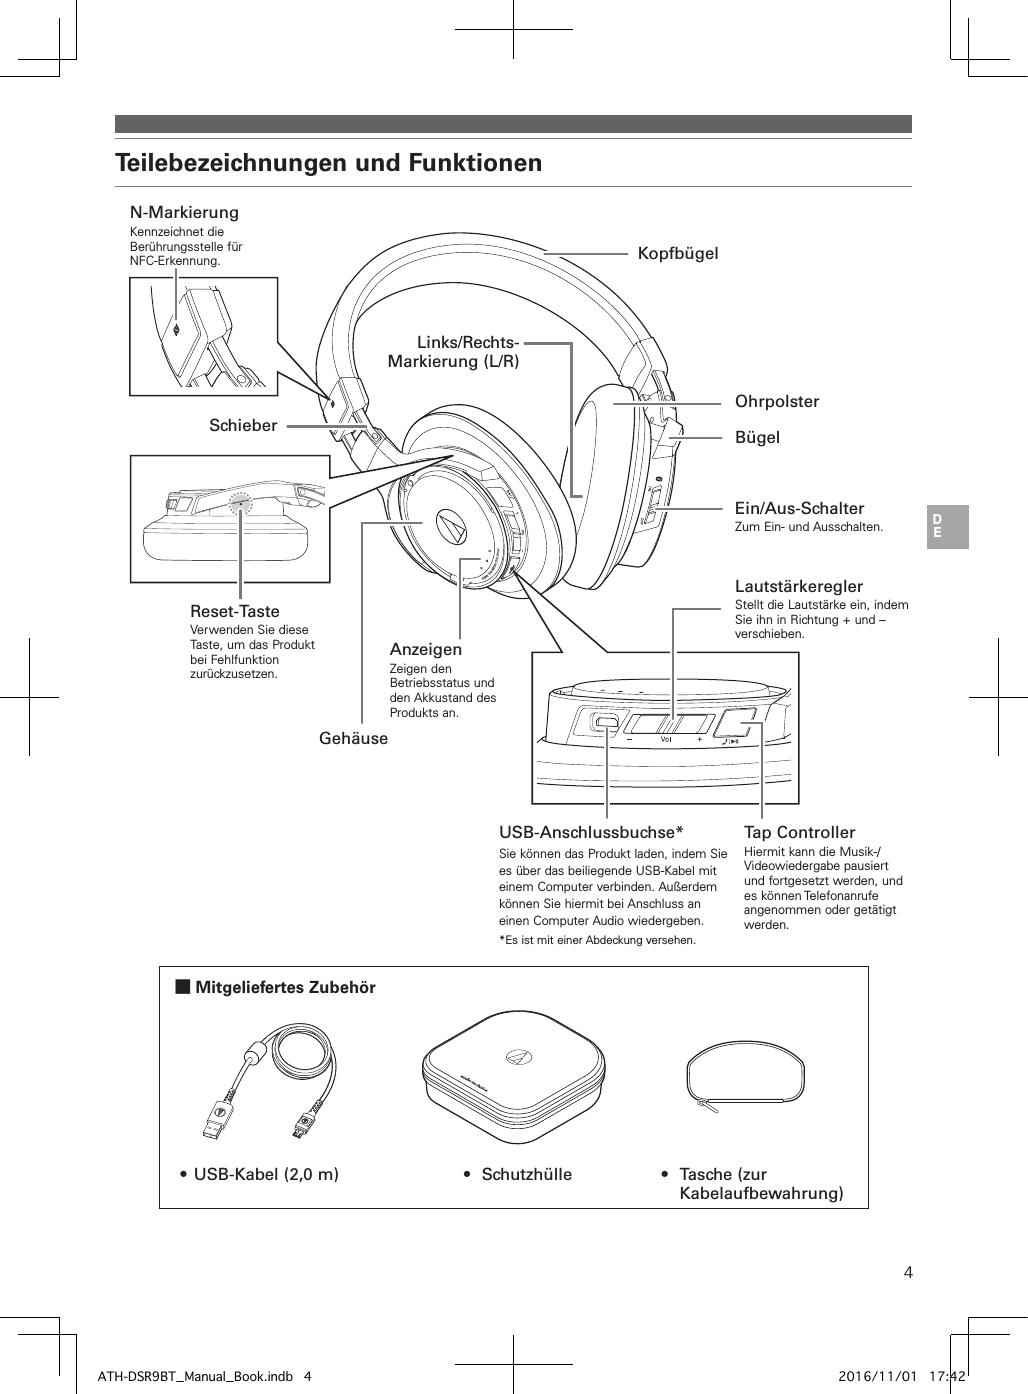 Page 55 of audio technica dsr9bt bluetooth headphones user manual ath dsr9bt manual book indb